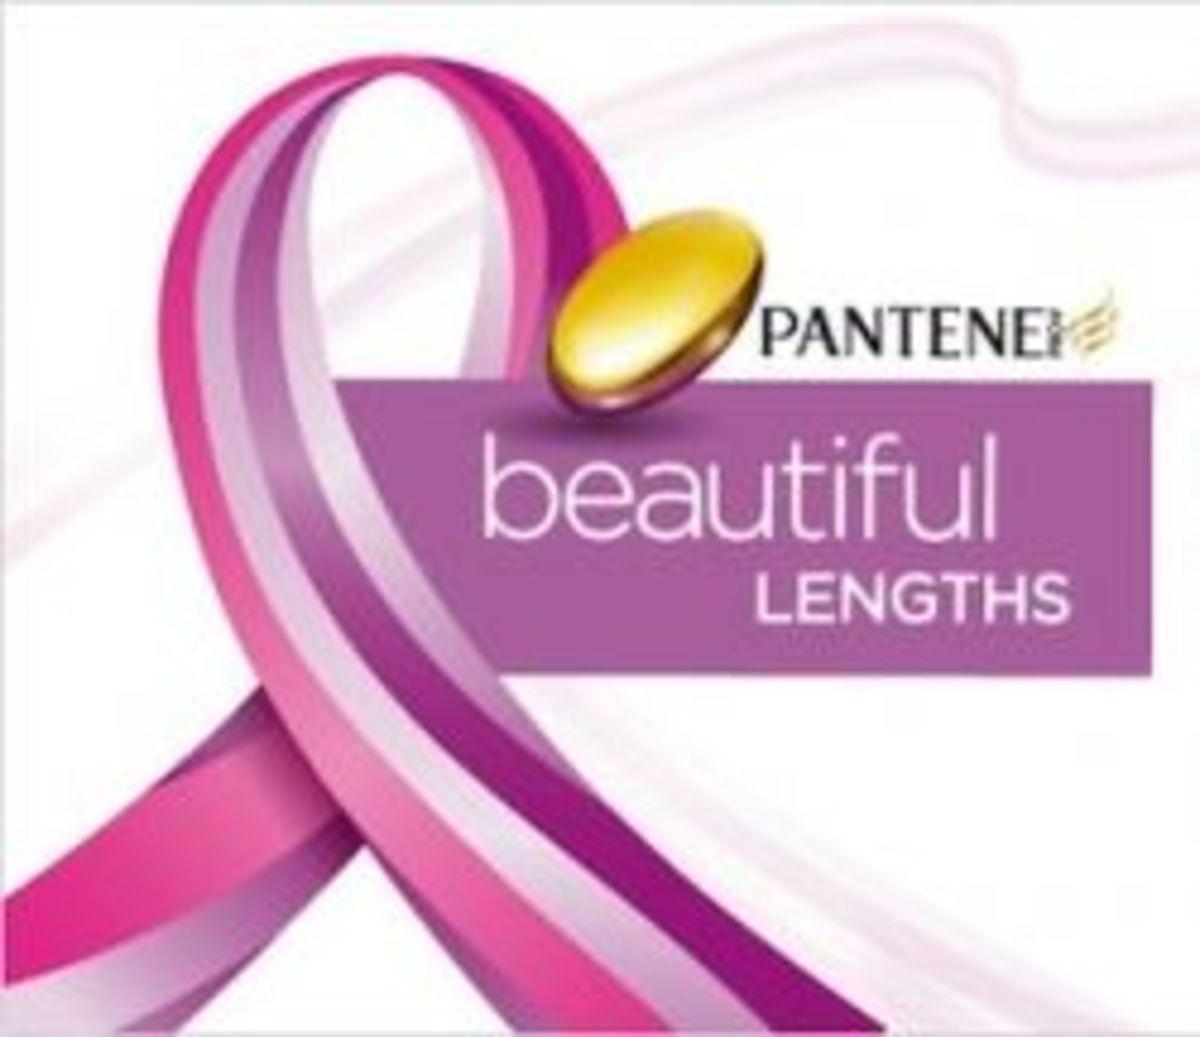 Pantene beautiful lengths hair donation program